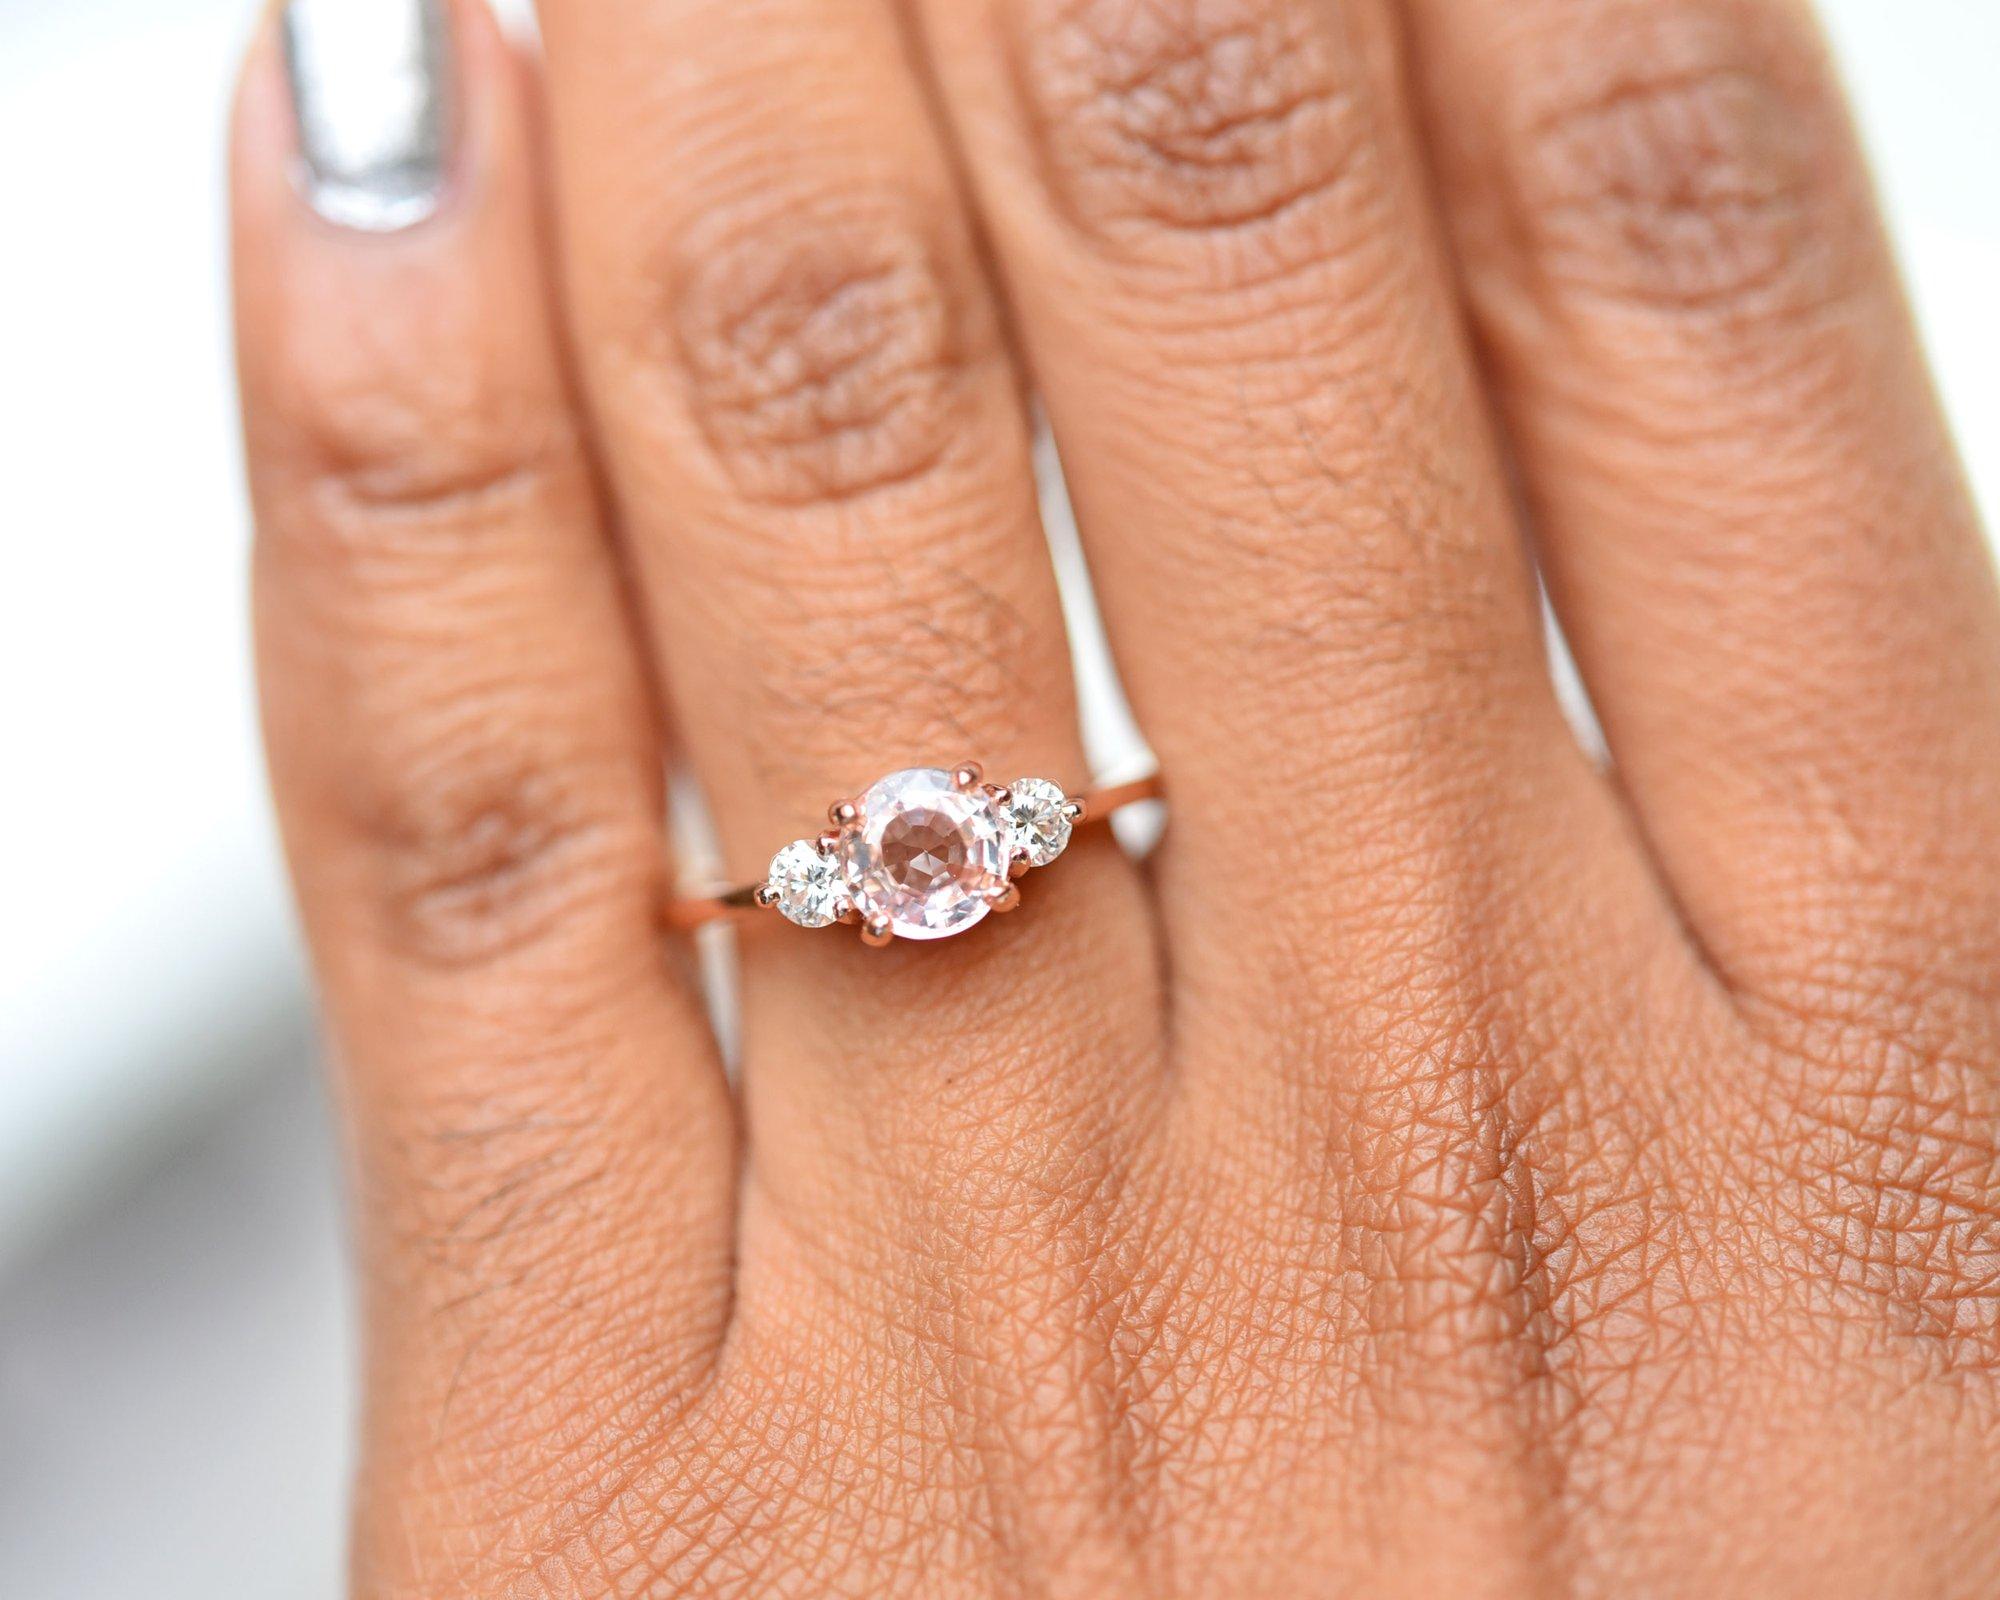 Zara Pink Sapphire Three Stone Engagement Ring by Valerie Madison Jewelry